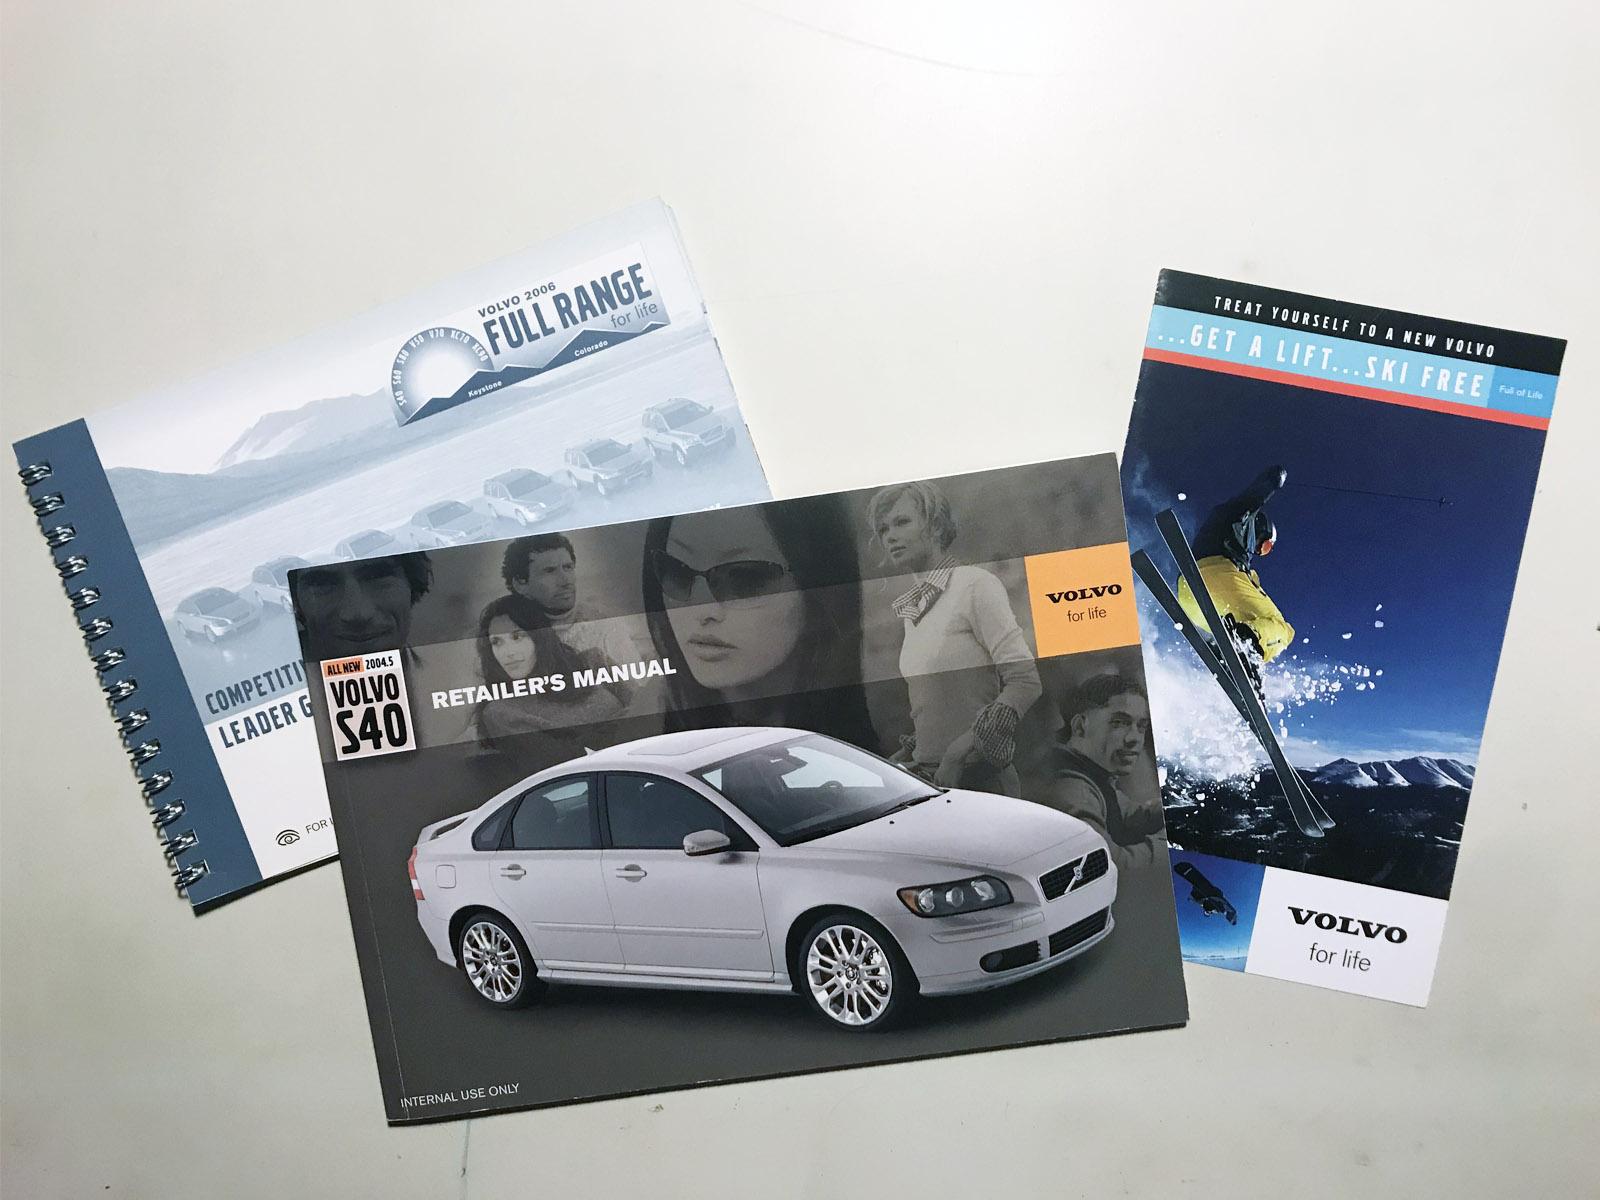 Volvo Materials